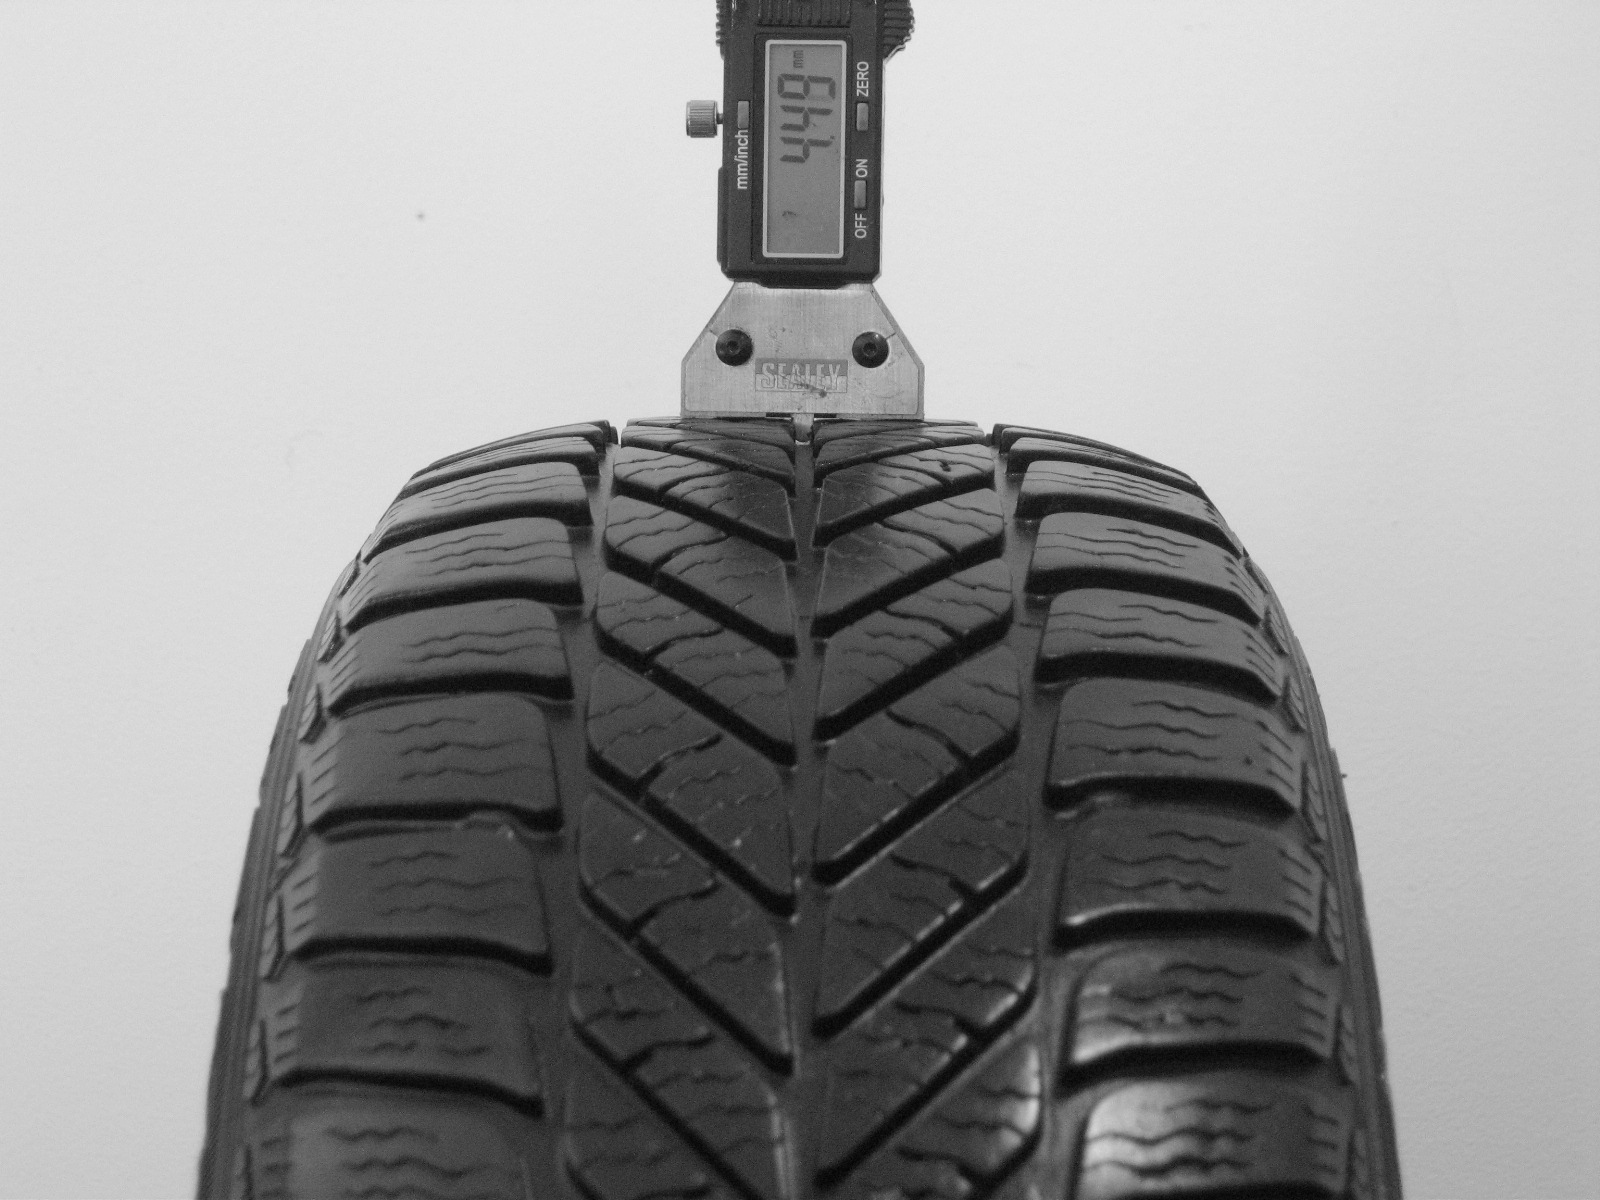 Použité-Pneu-Bazar - 175/65 R14 GOODYEAR ULTRAGRIP 5 -kusovka-rezerva 3mm